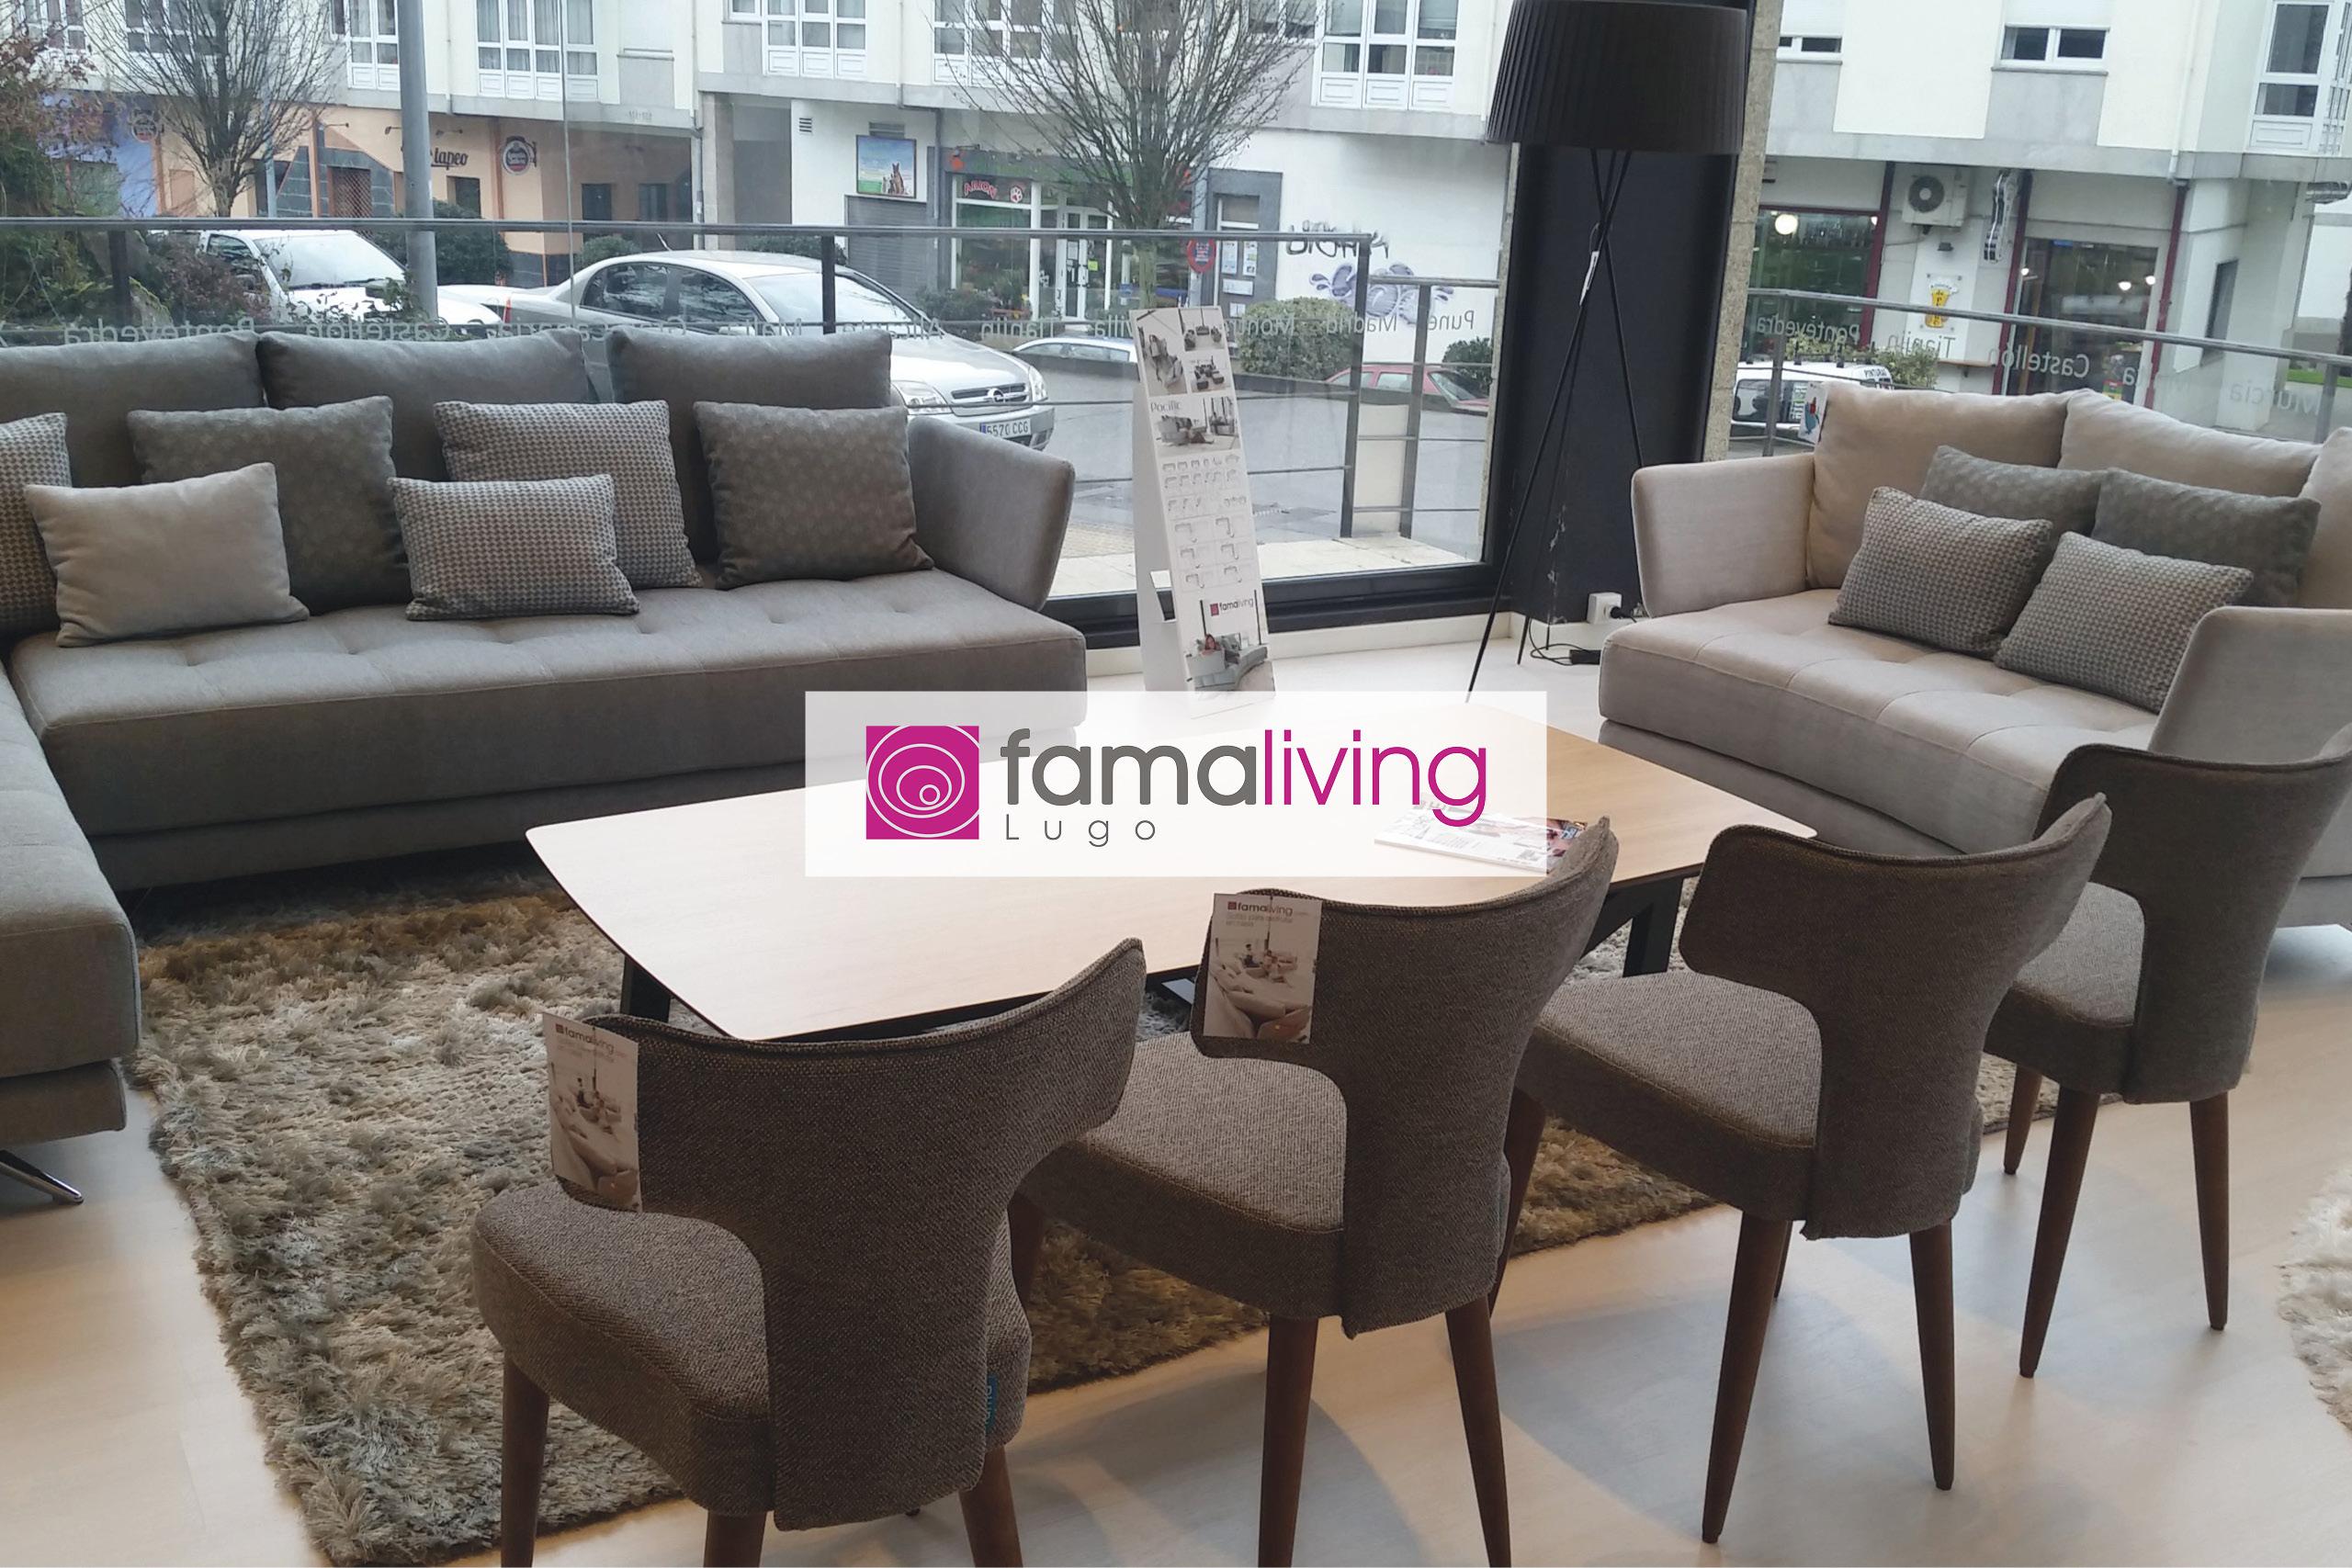 Famaliving Lugo - Sofa Store.